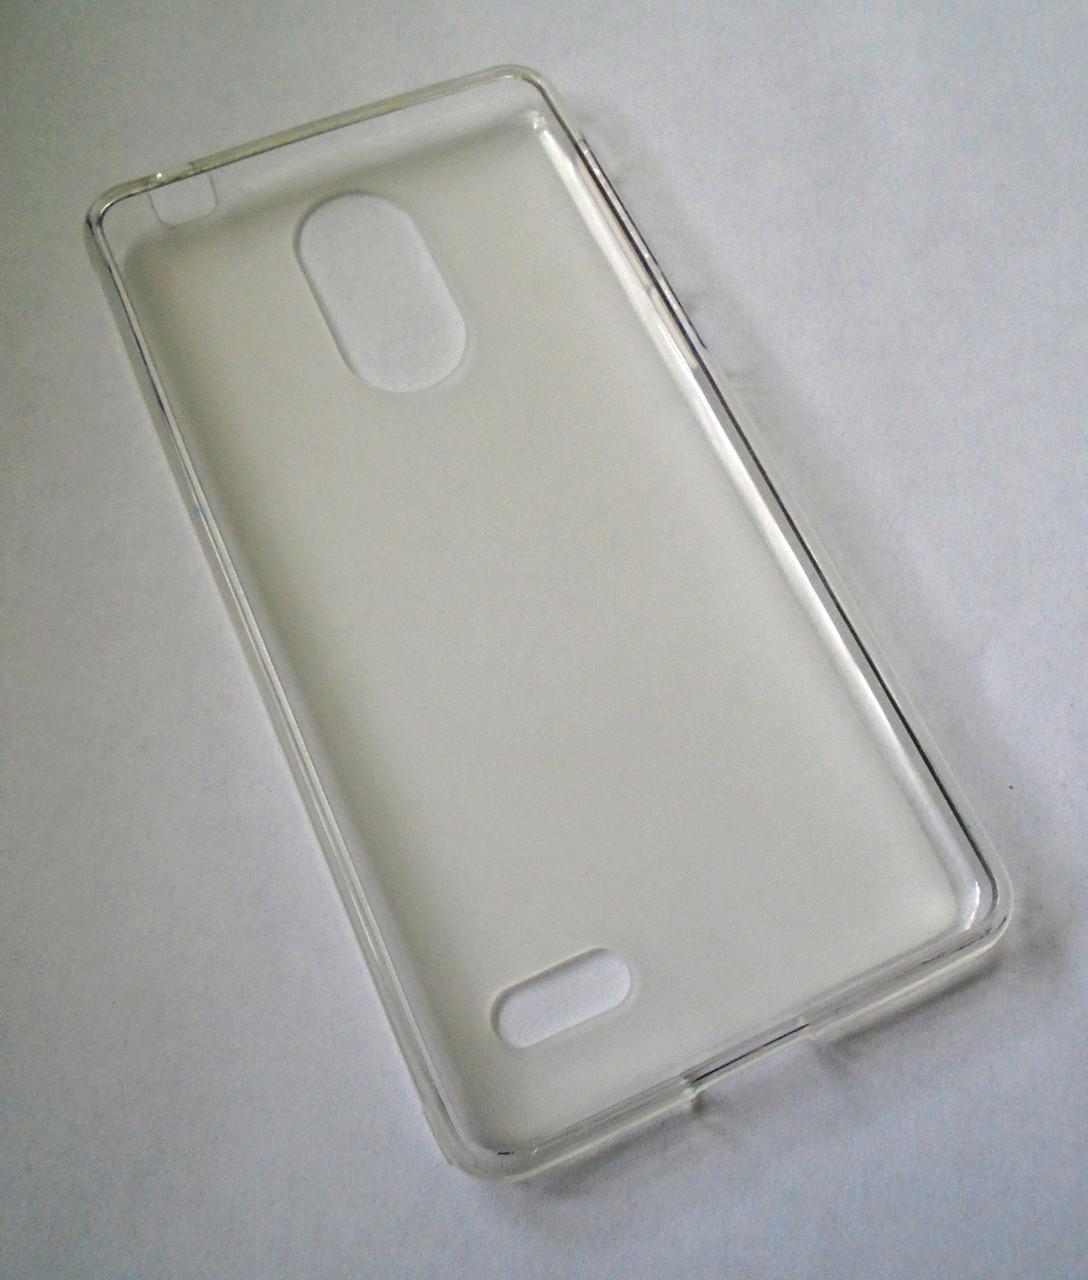 Чехол бампер силиконовый Leagoo M5 белый